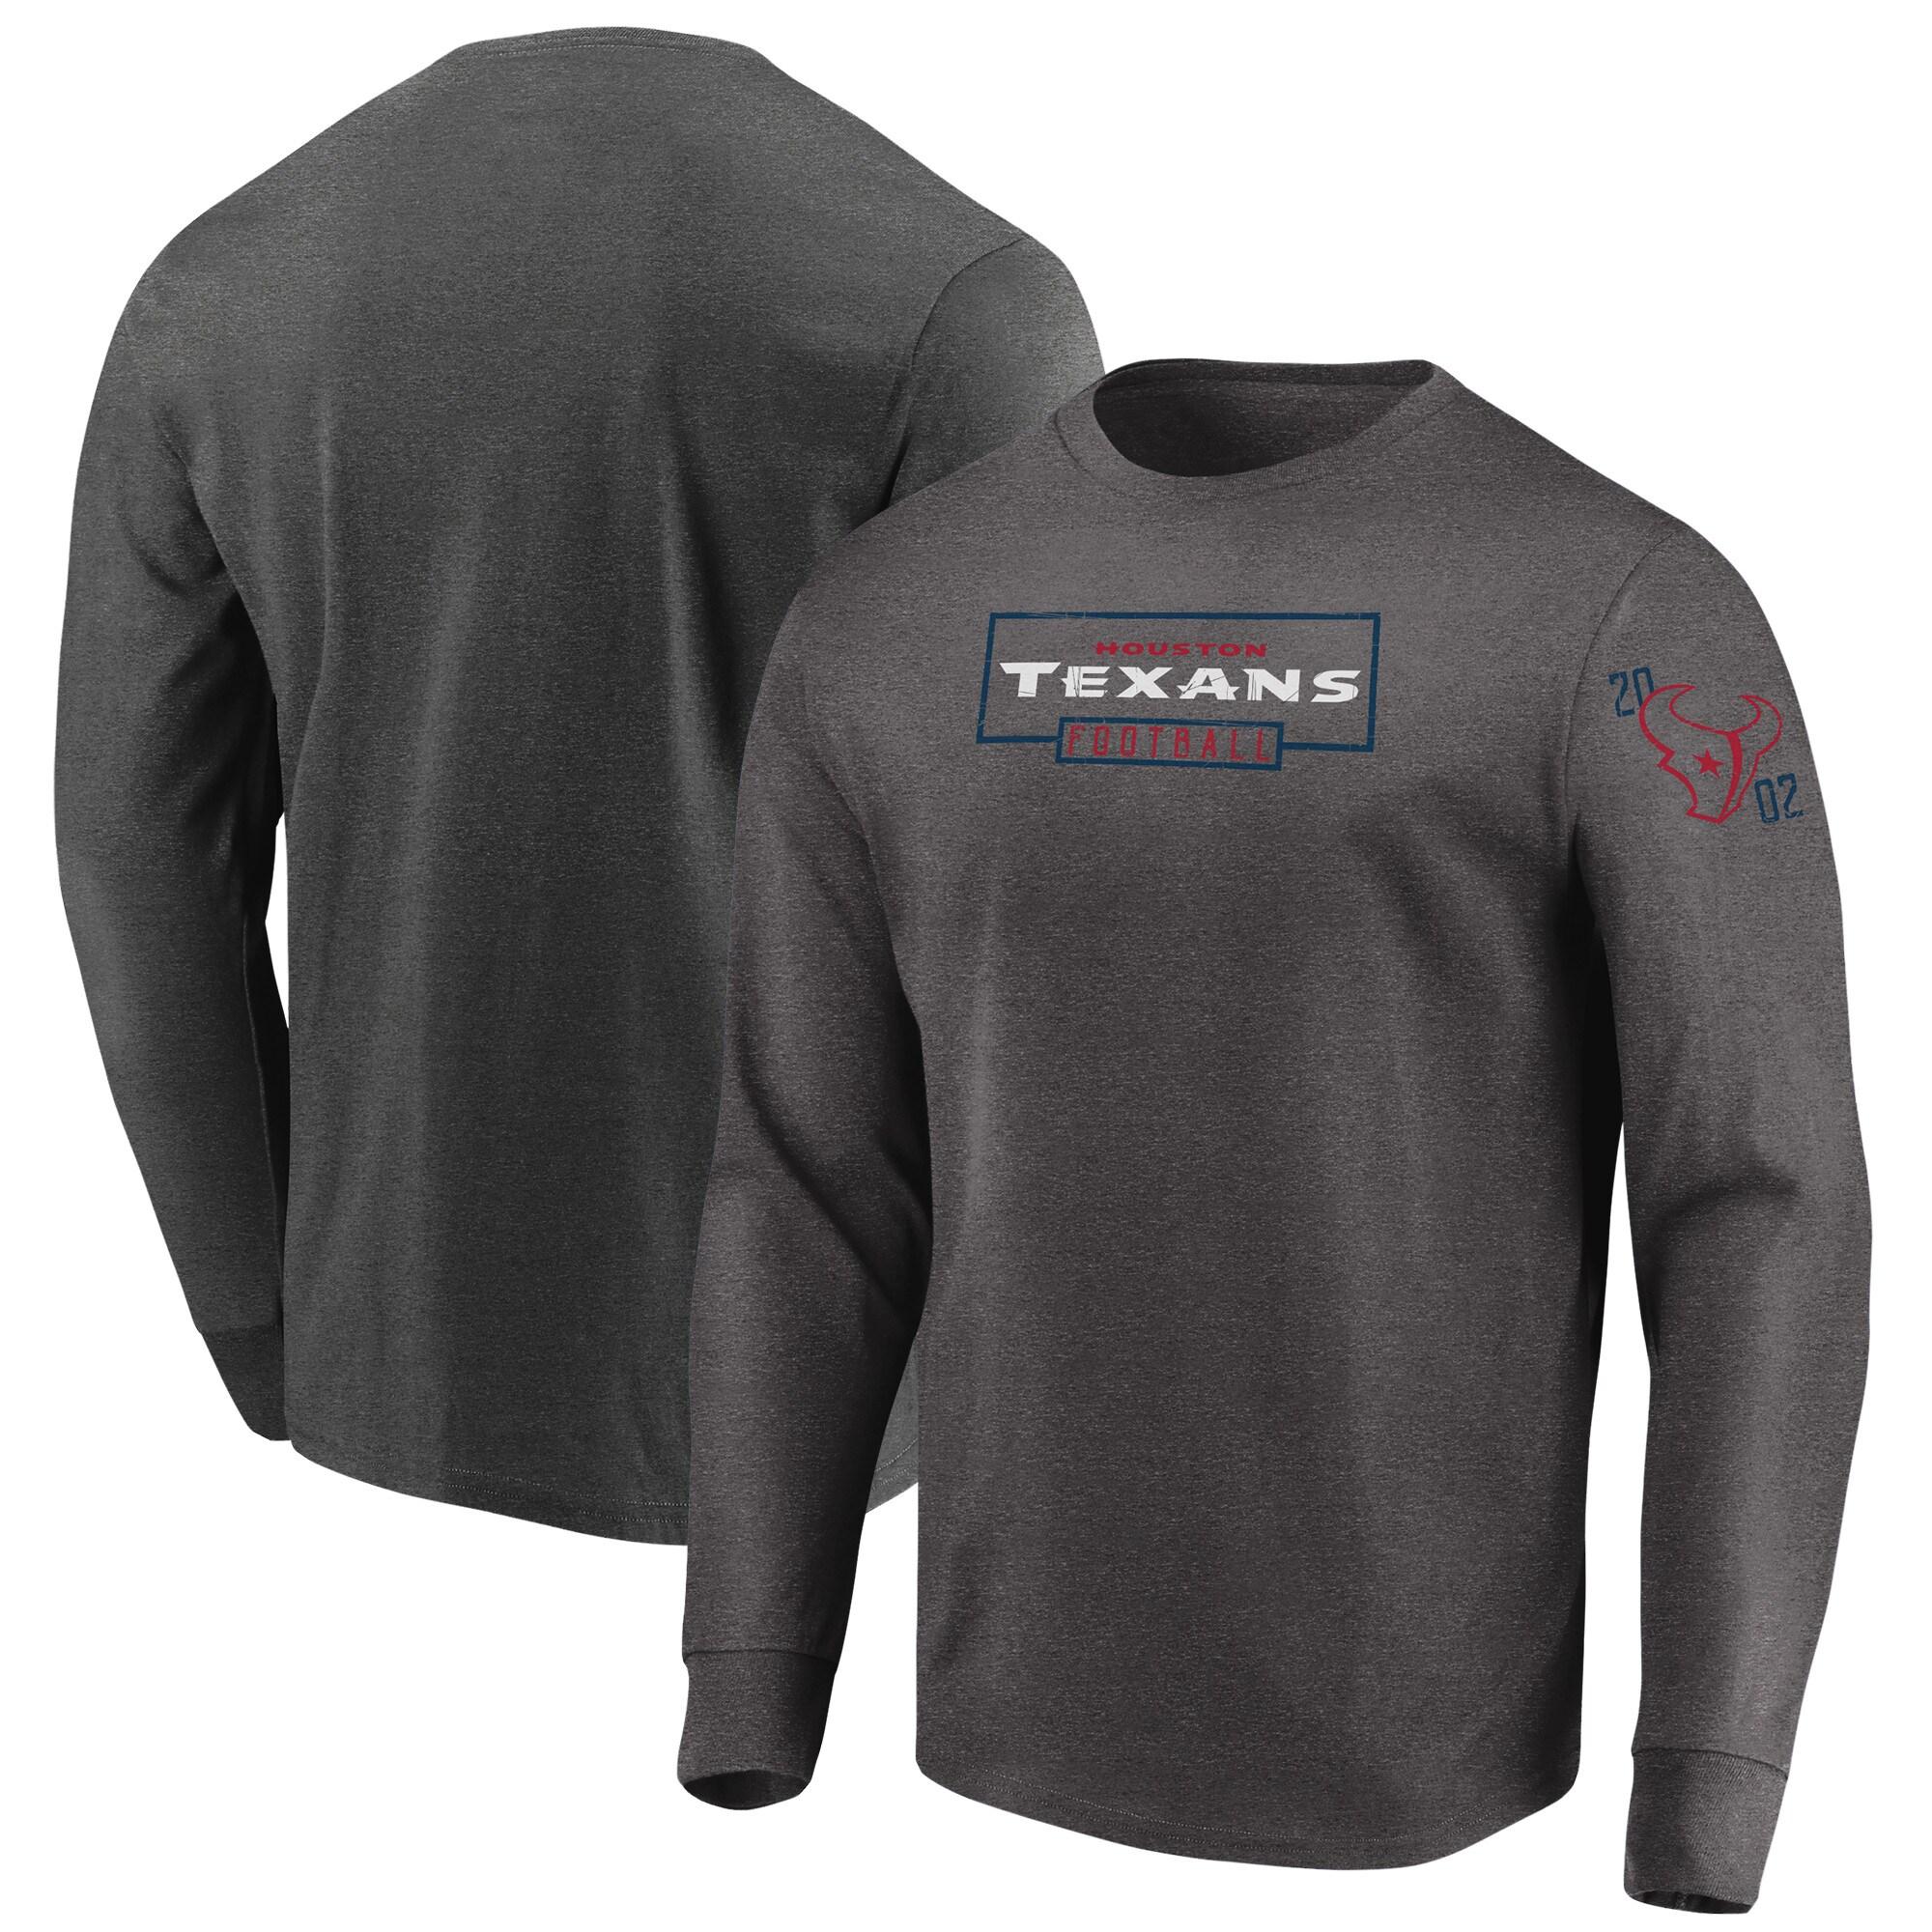 Houston Texans Majestic Big & Tall Kick Return Long Sleeve T-Shirt - Heathered Charcoal